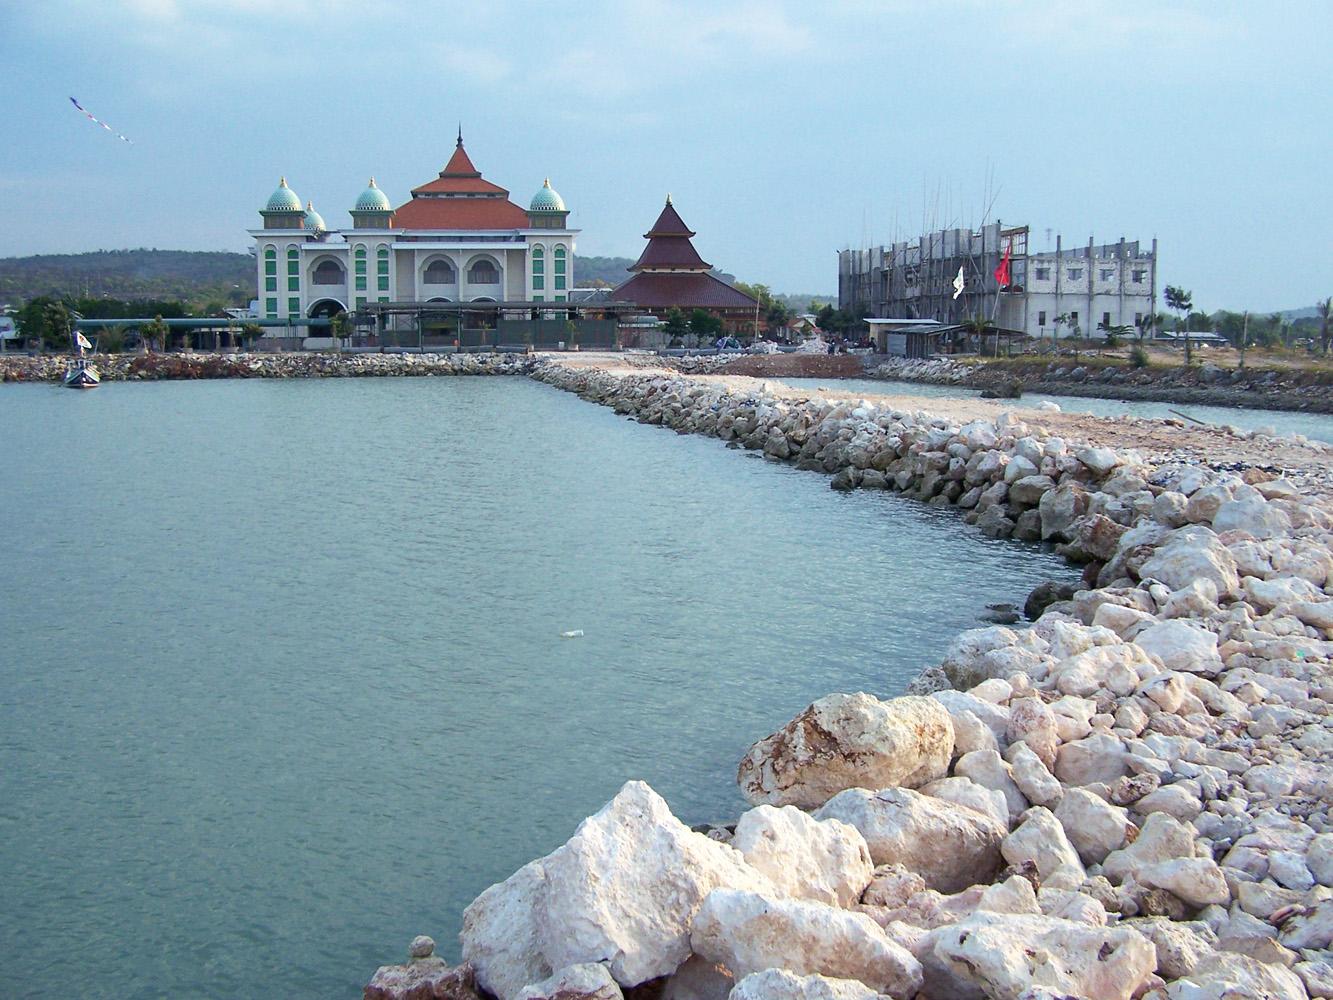 Pertualangan Wisata Kuliner Oktober 2014 Masjid Bangunan Makam Tpq Dewi